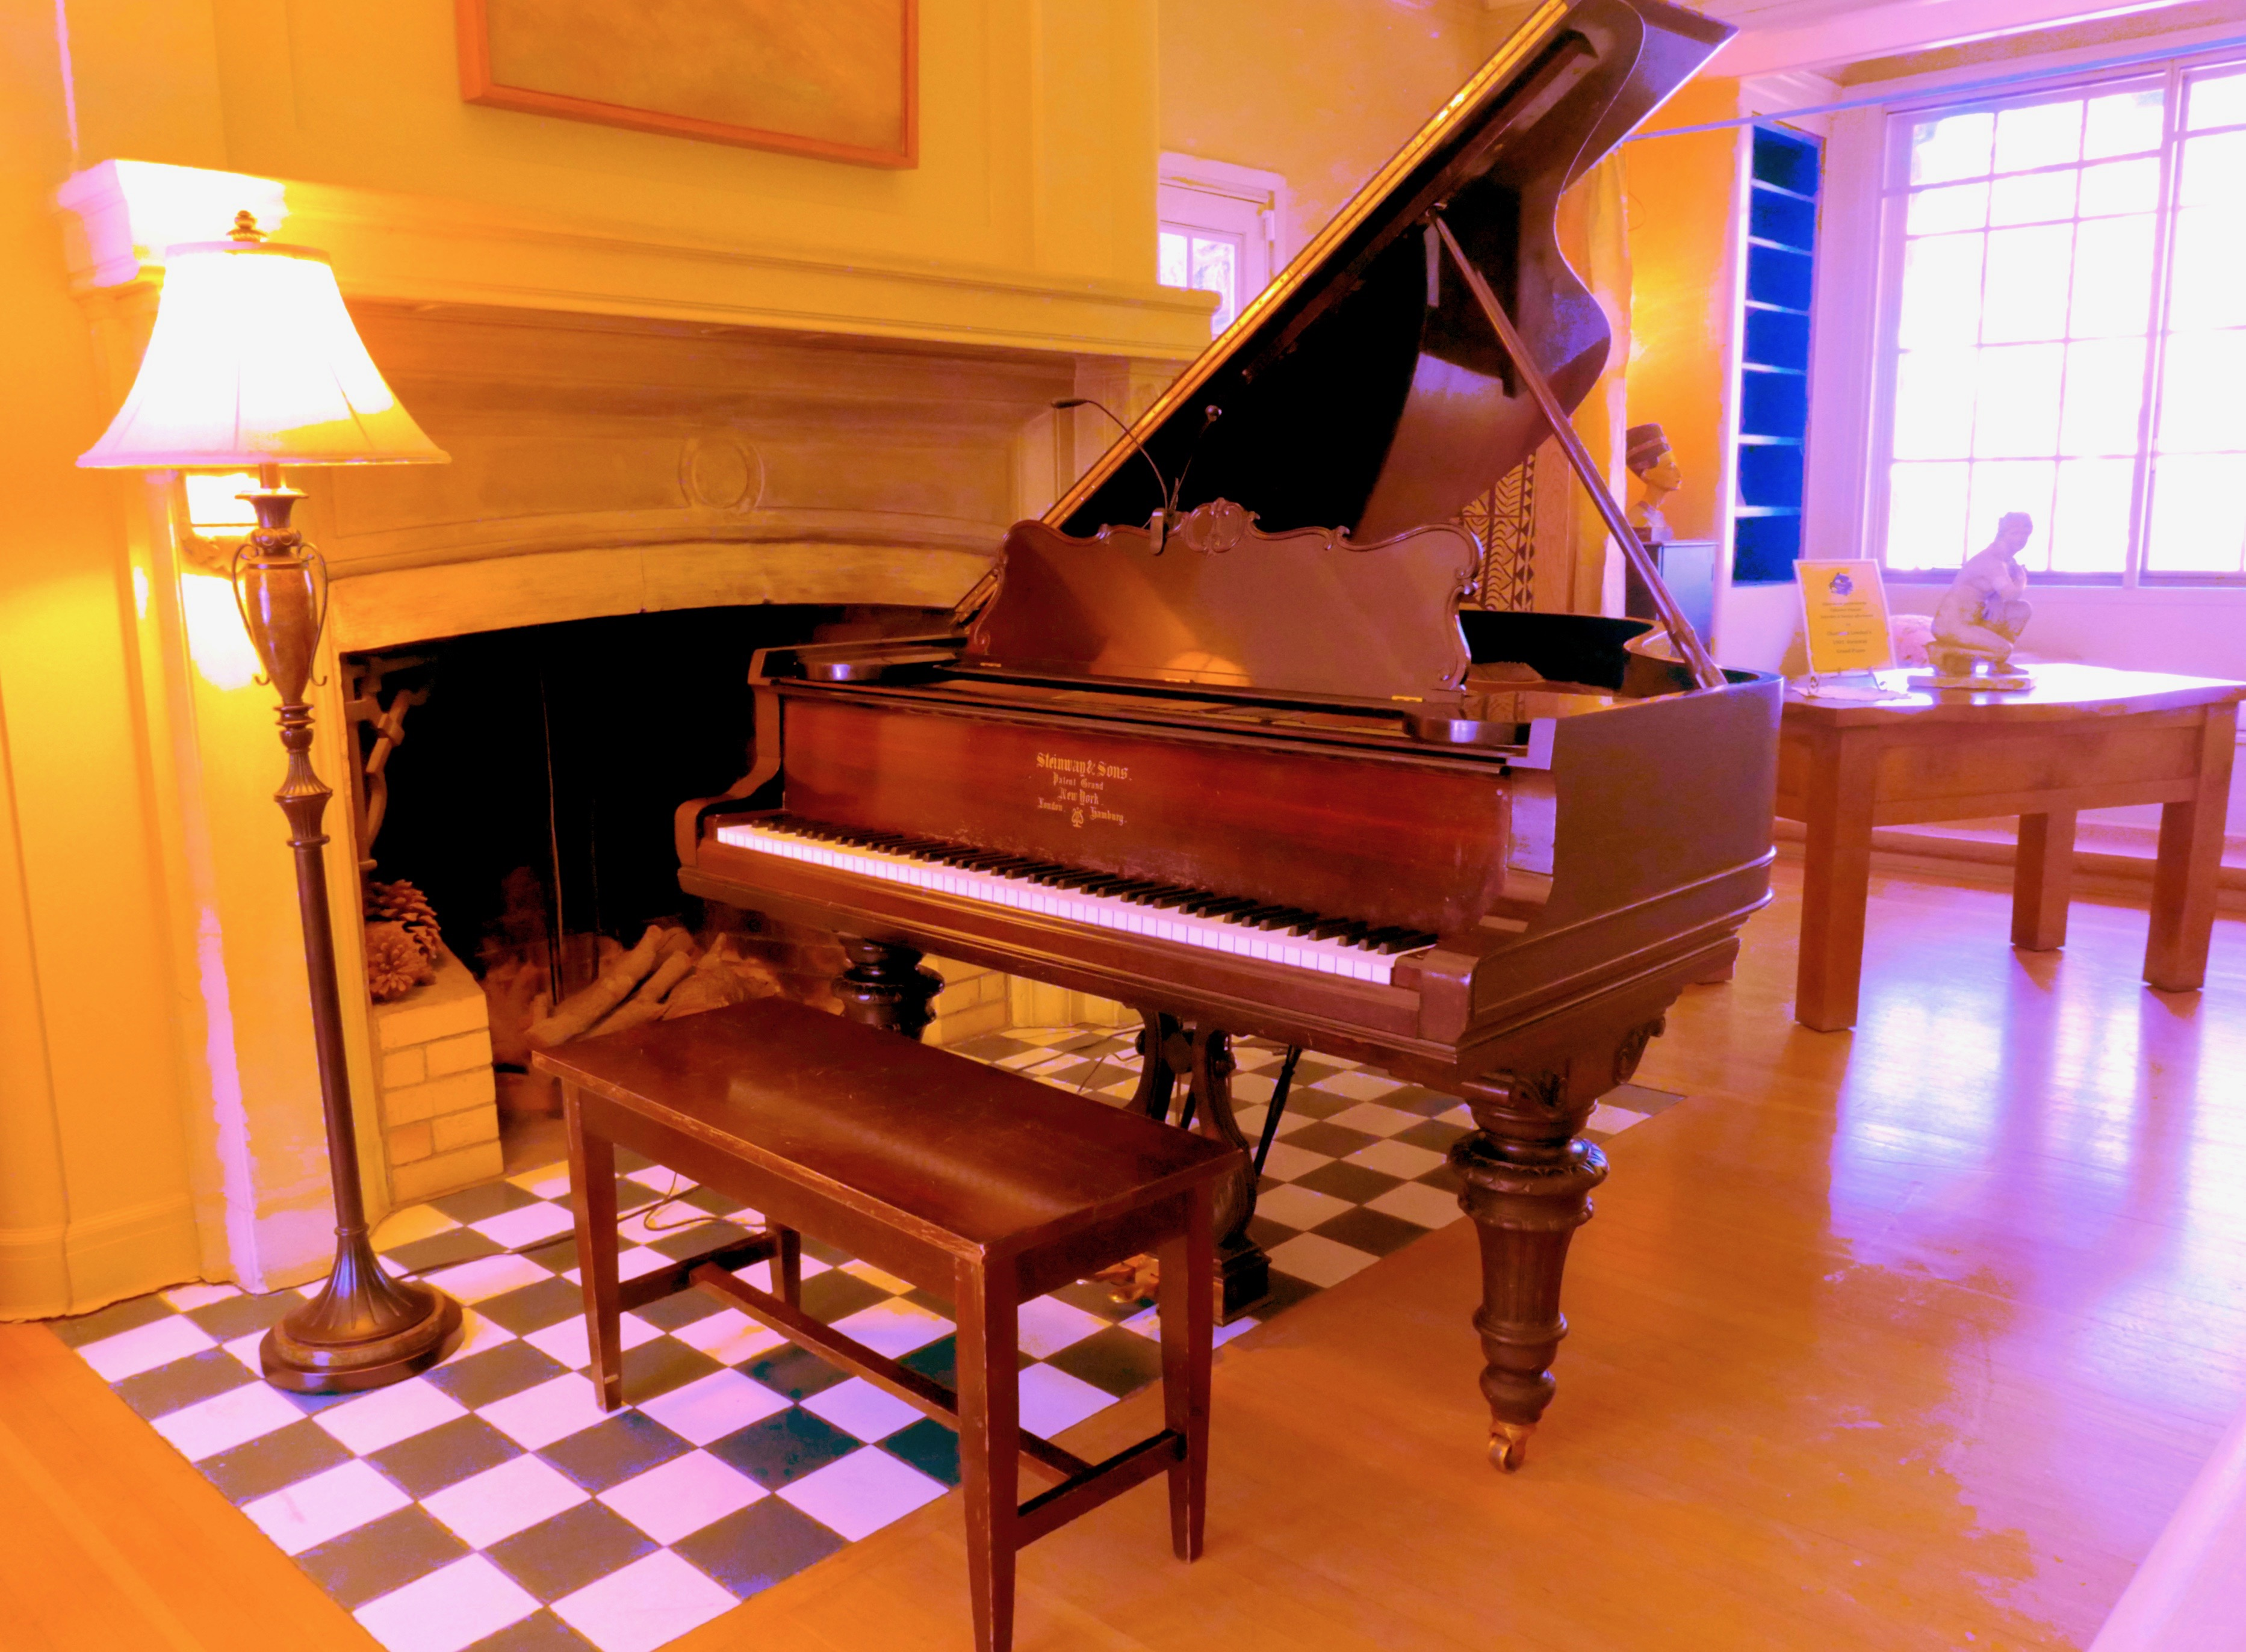 Chairman's Piano